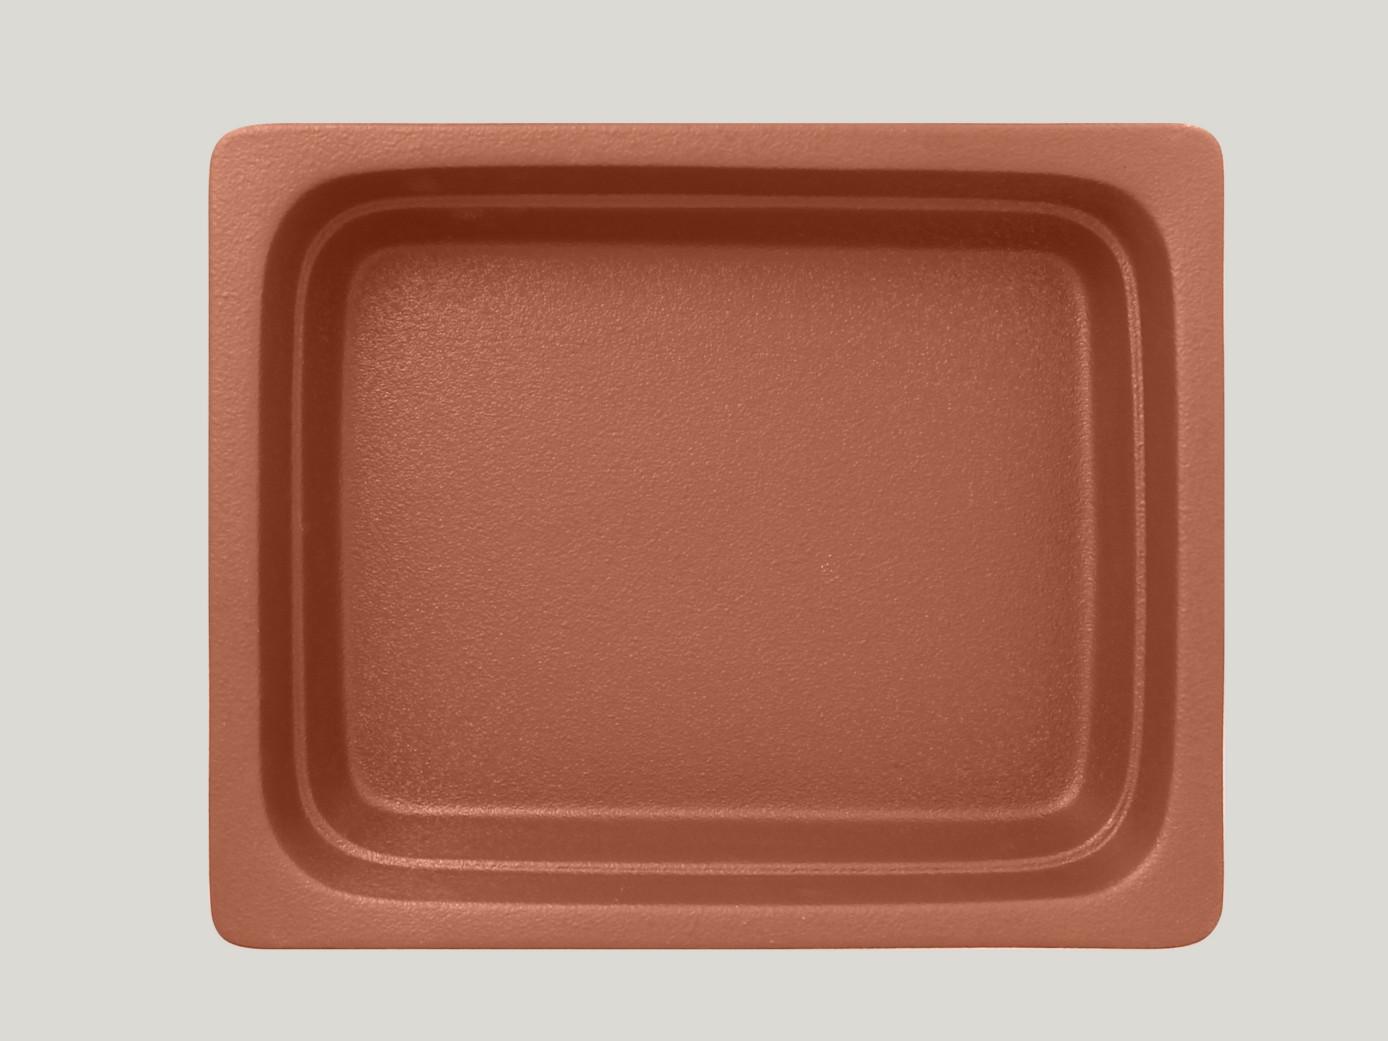 Neofusion gastronádoba GN 1/2 065 mm - hnědá